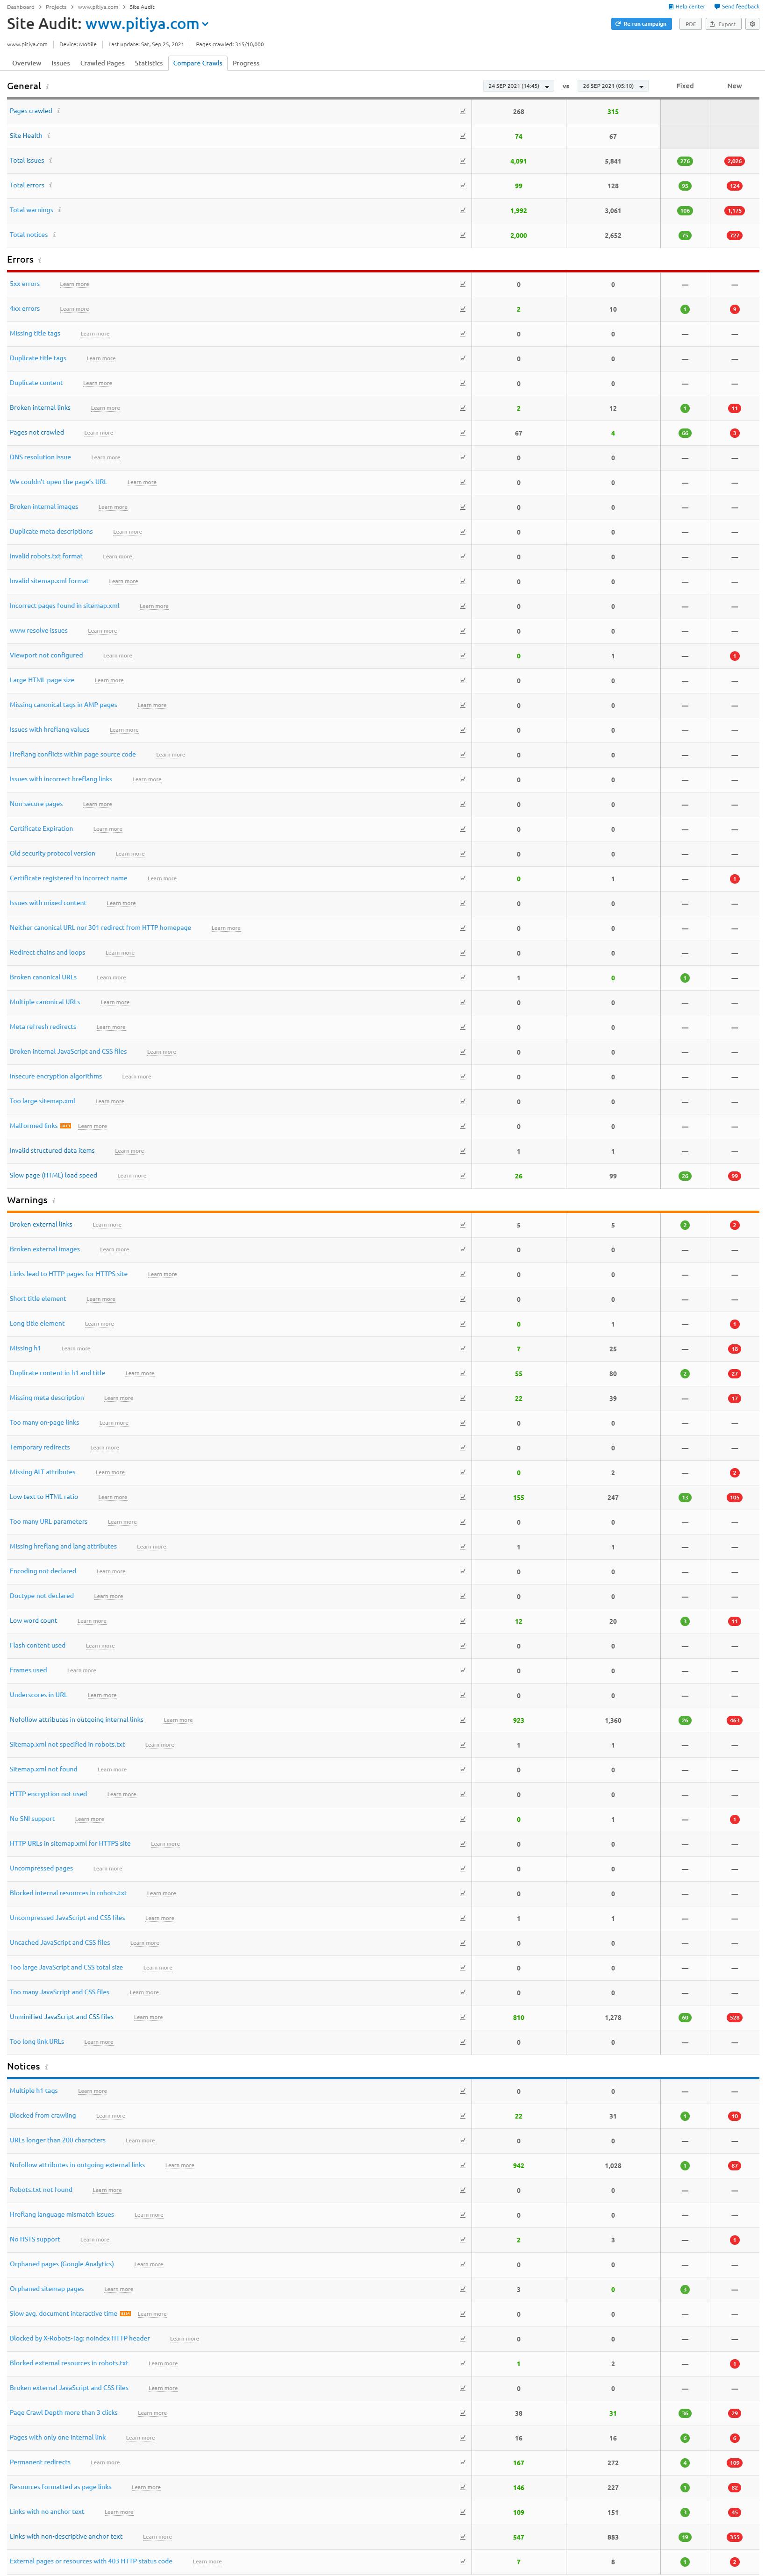 compare-crawls-table-semrush-site-auditor